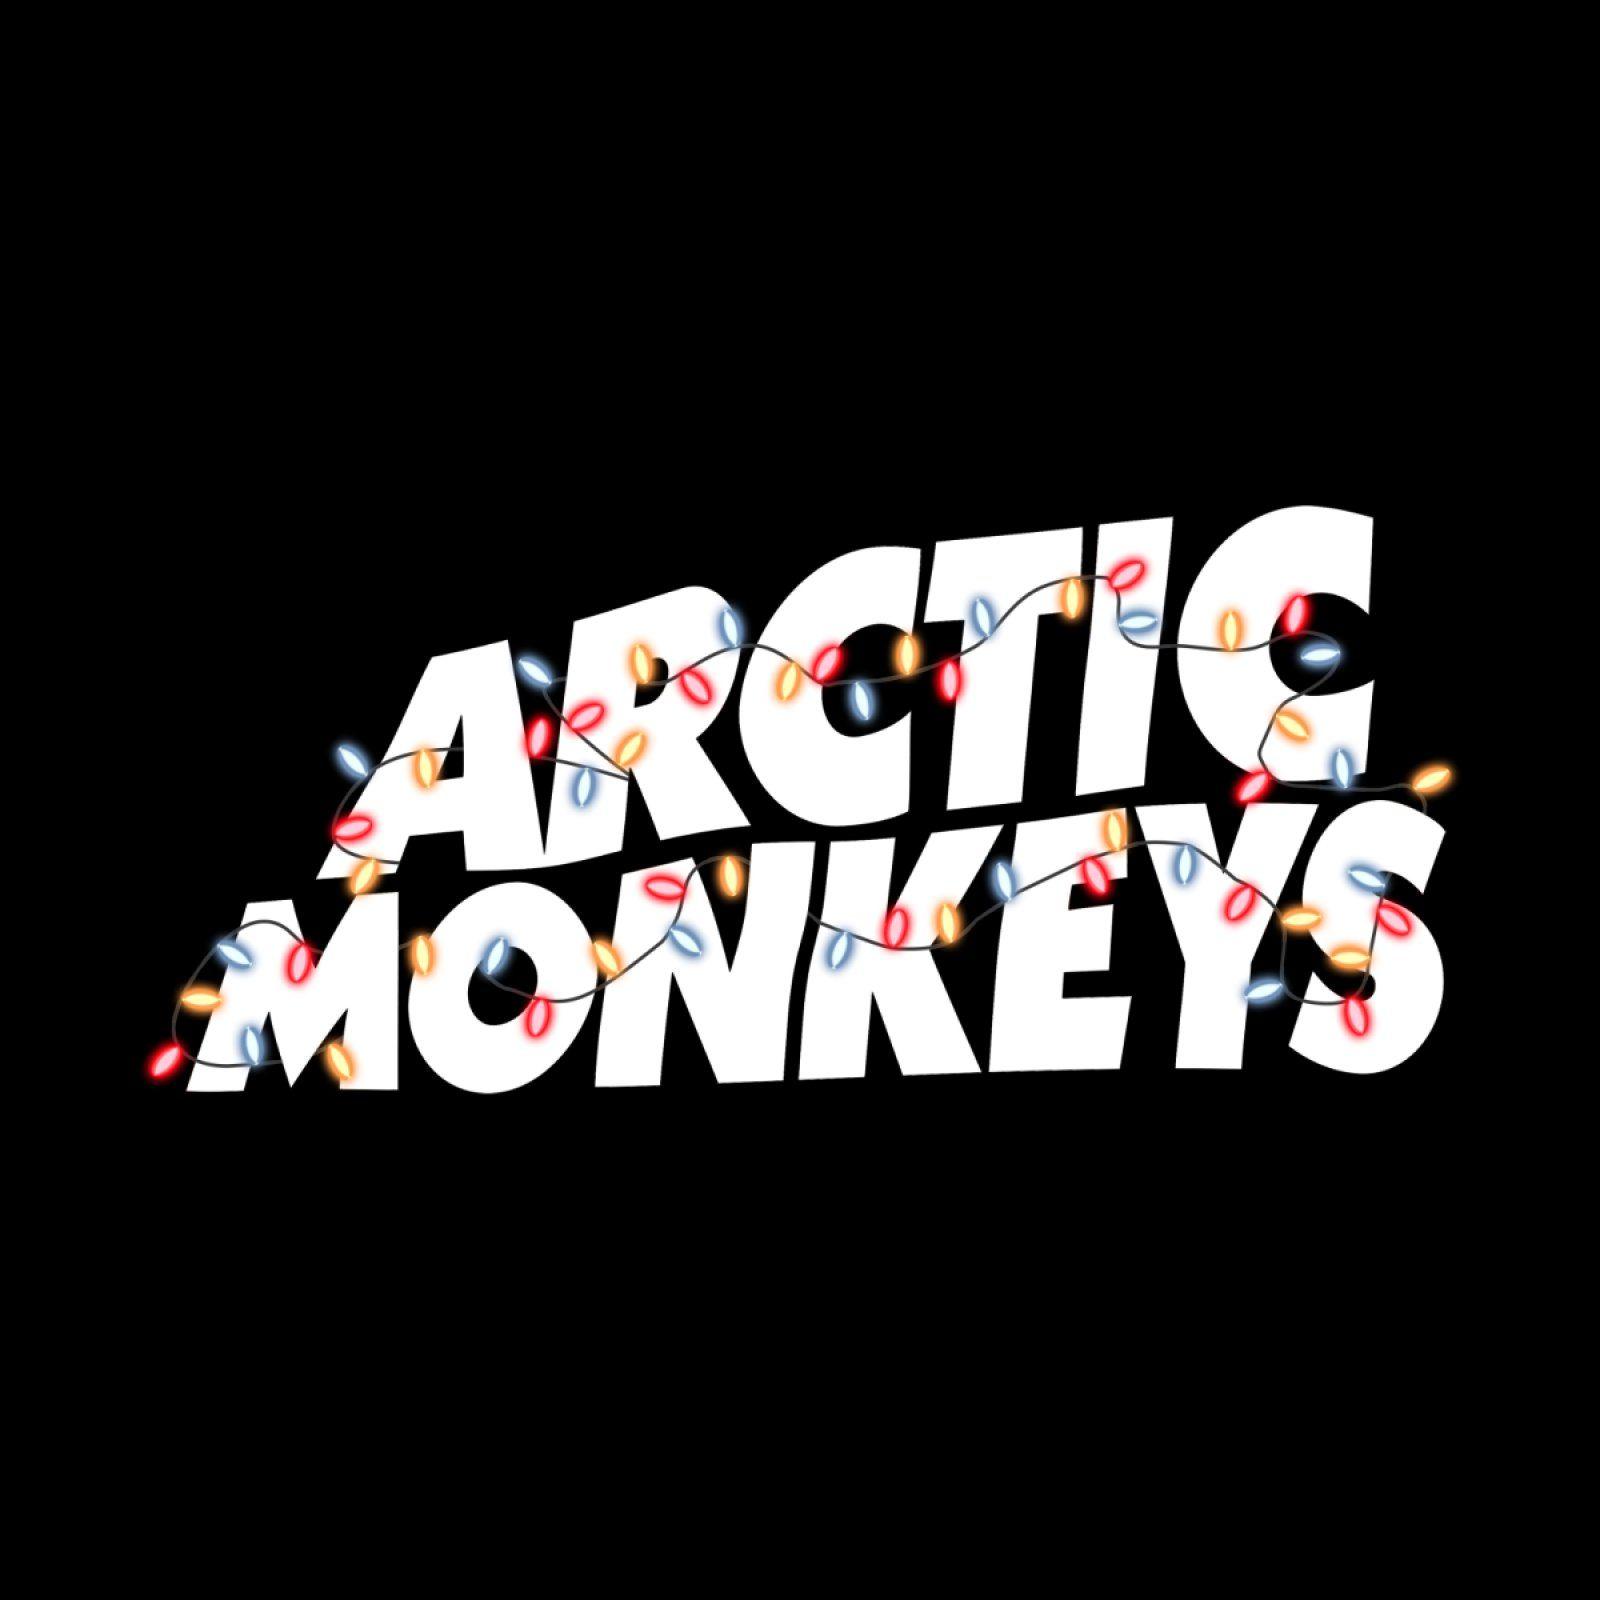 Arctic Monkeys Logo Xmas Tee In 2021 Monkey Logo Arctic Monkeys Arctic Monkeys Logo